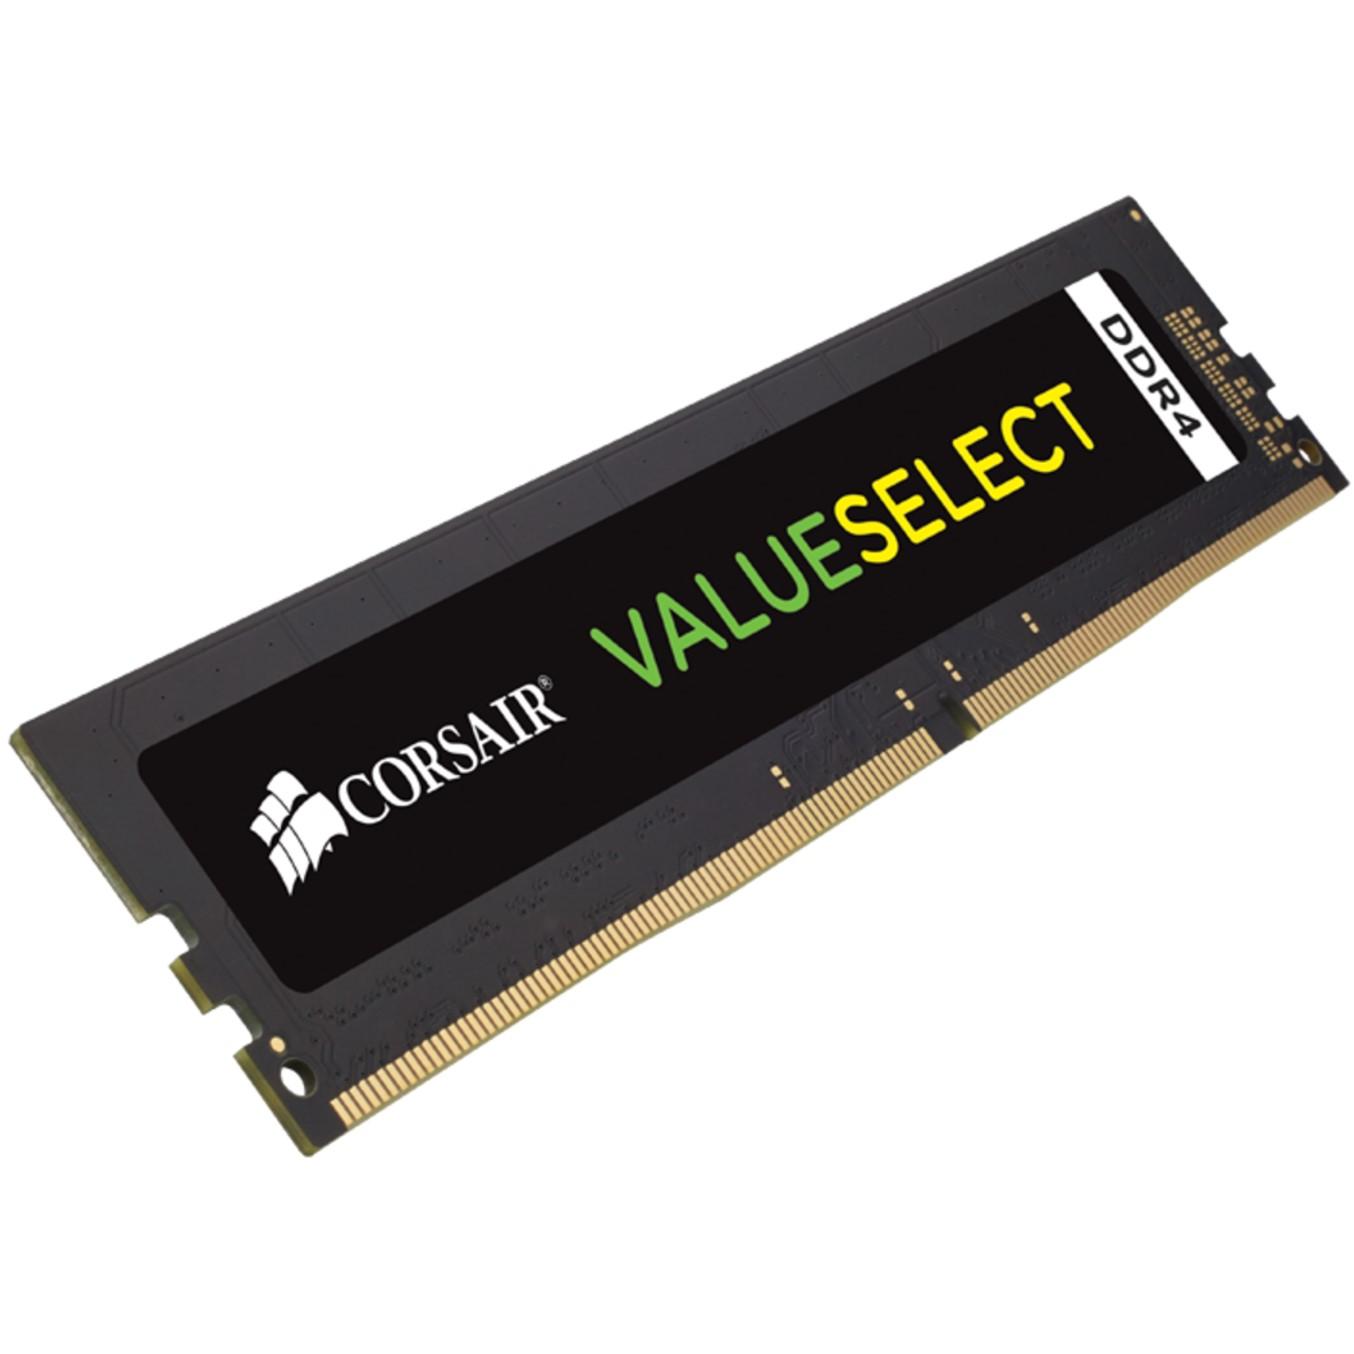 MEMORIA DDR4 8GB CORSAIR VALUESELECT   PC4-19200